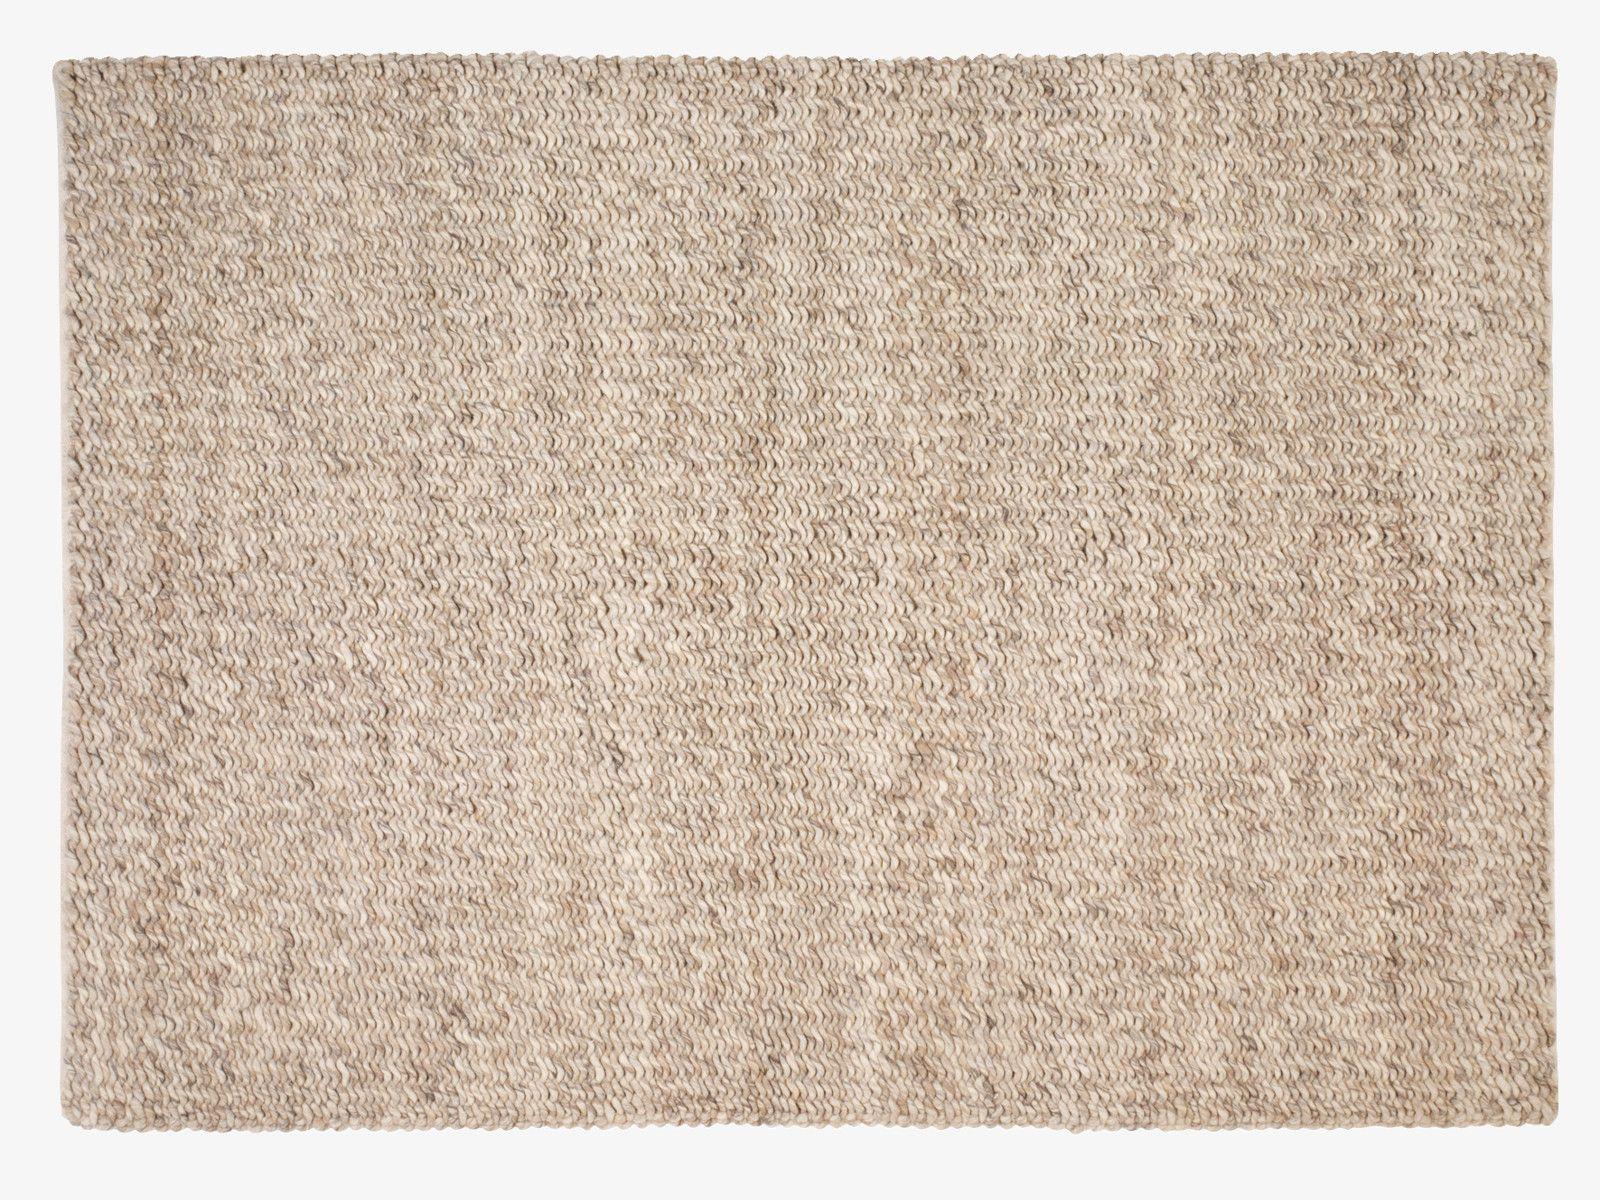 Oatmeal Neutral Wool Blend Large Textured Wool Rug 170 X 240cm Habitatuk Natural Wool Rugs Rugs Beige Carpet